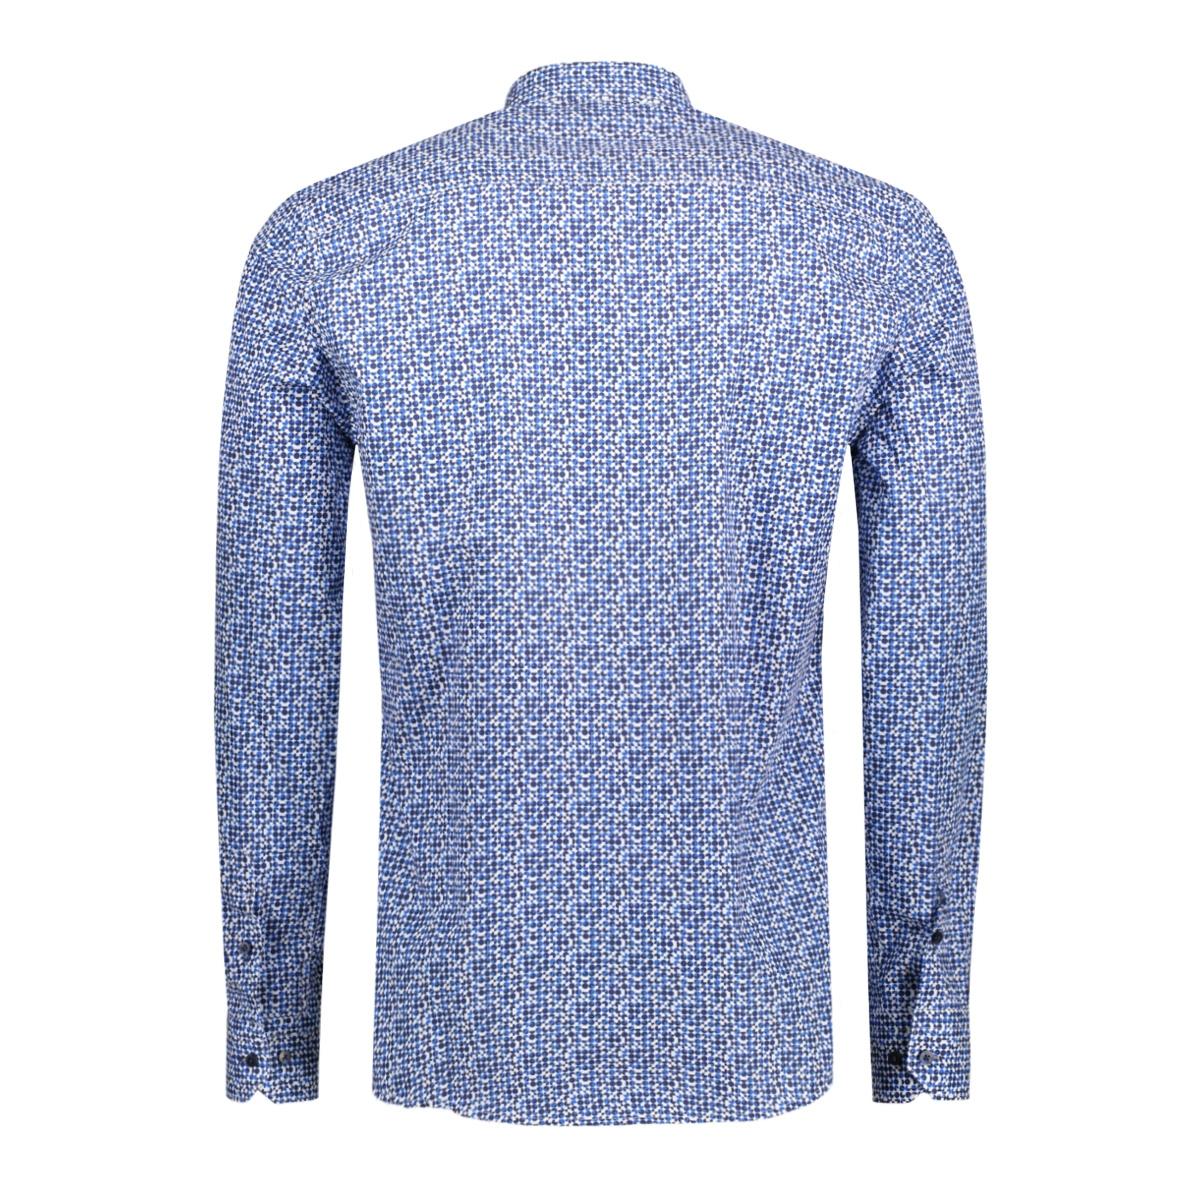 32656 gabbiano overhemd d5